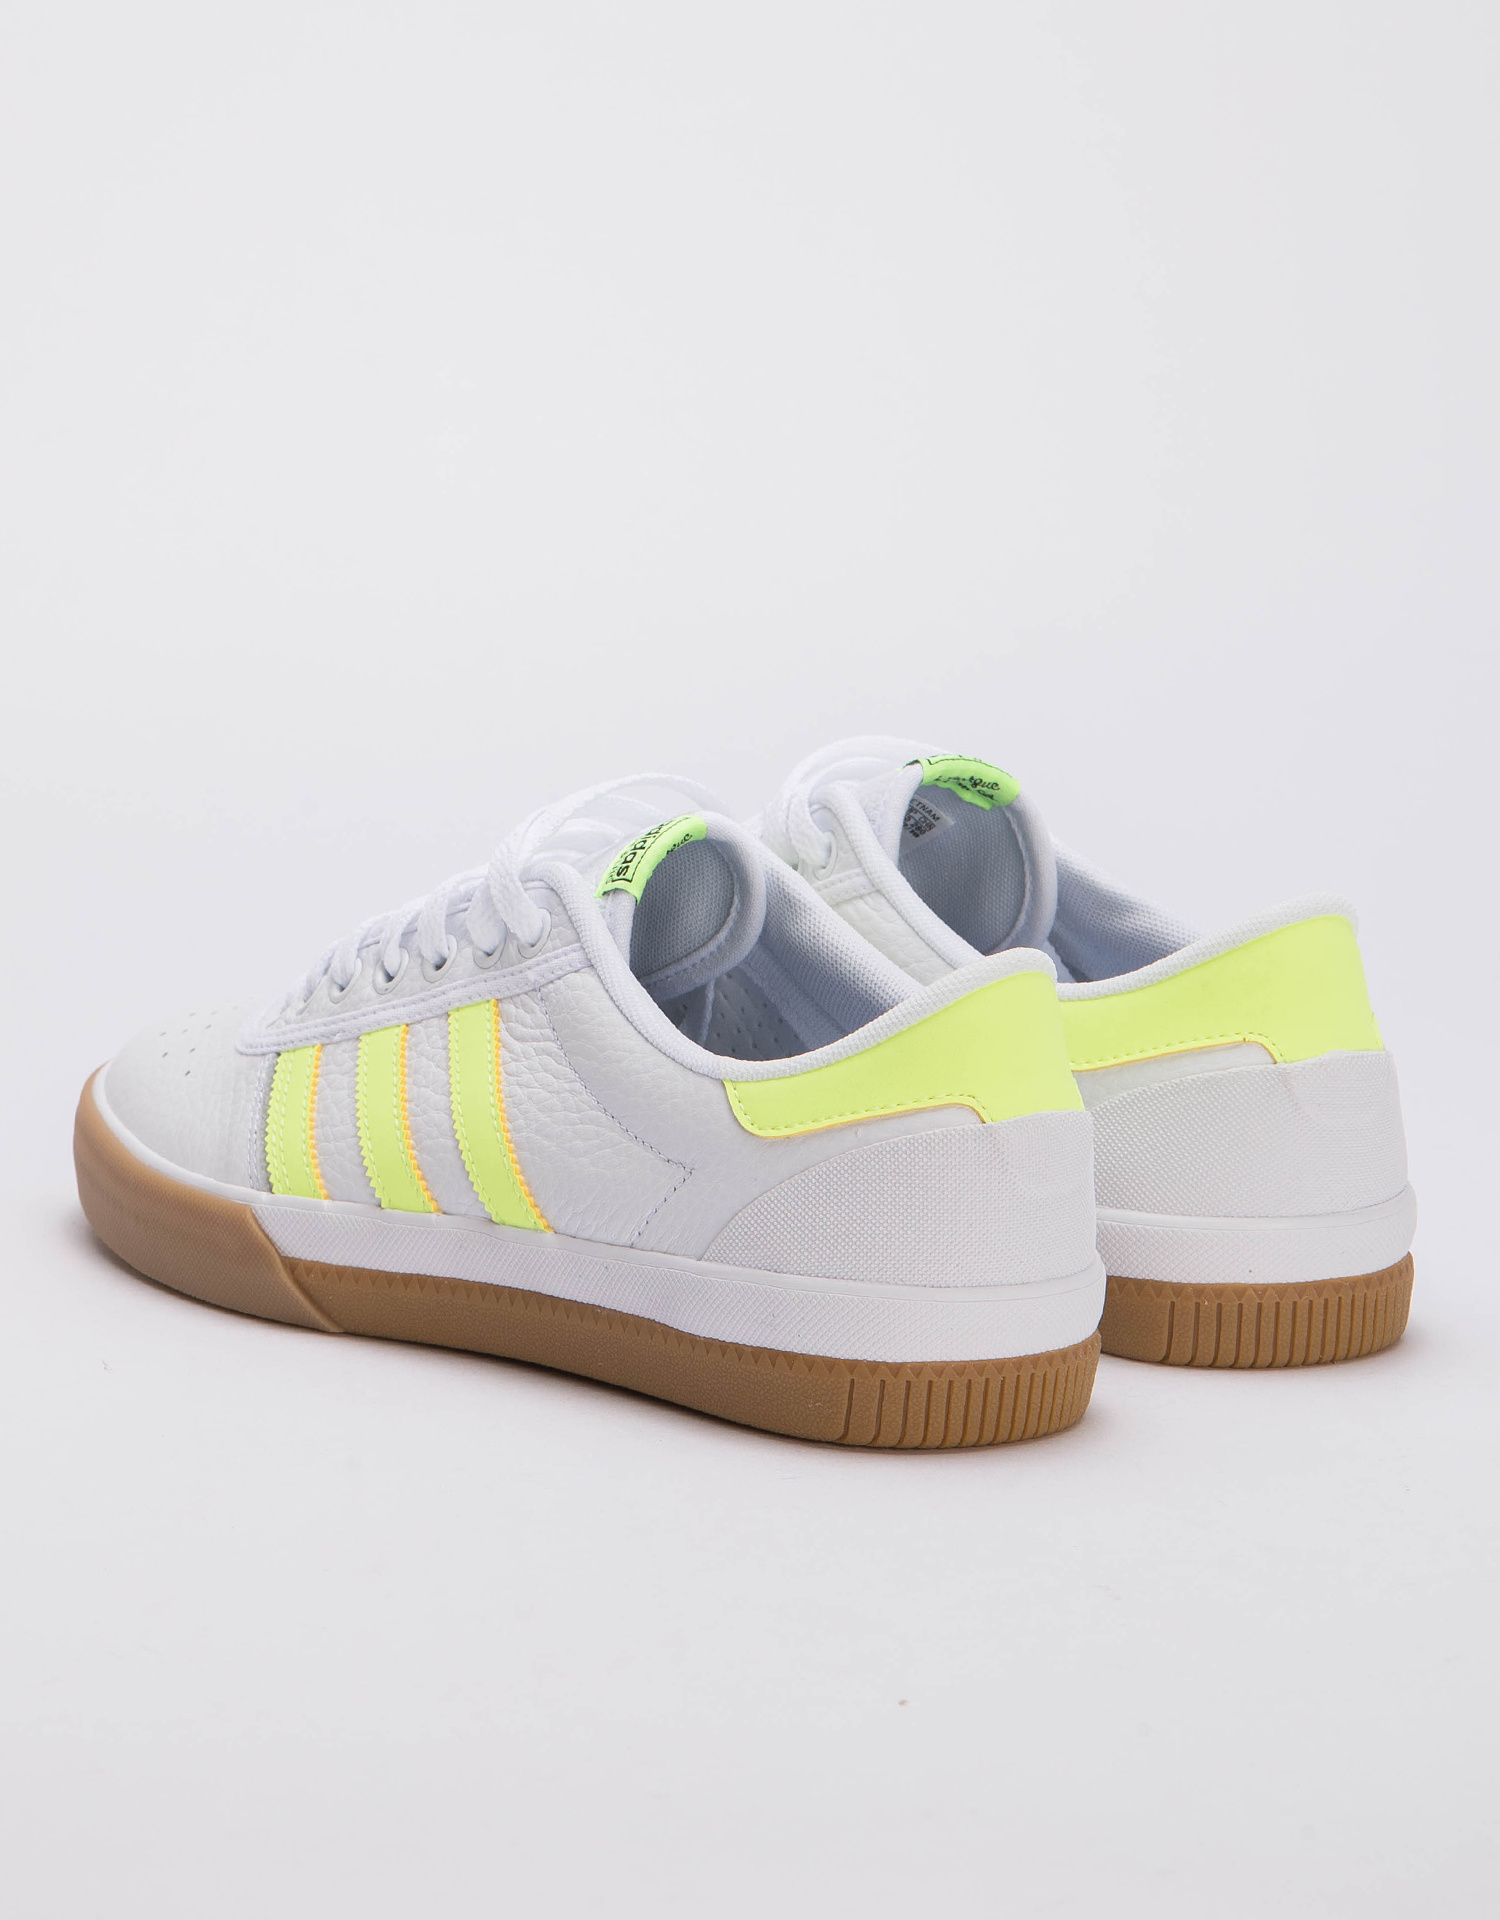 Adidas Lucas Premiere White/Hireye/Gum